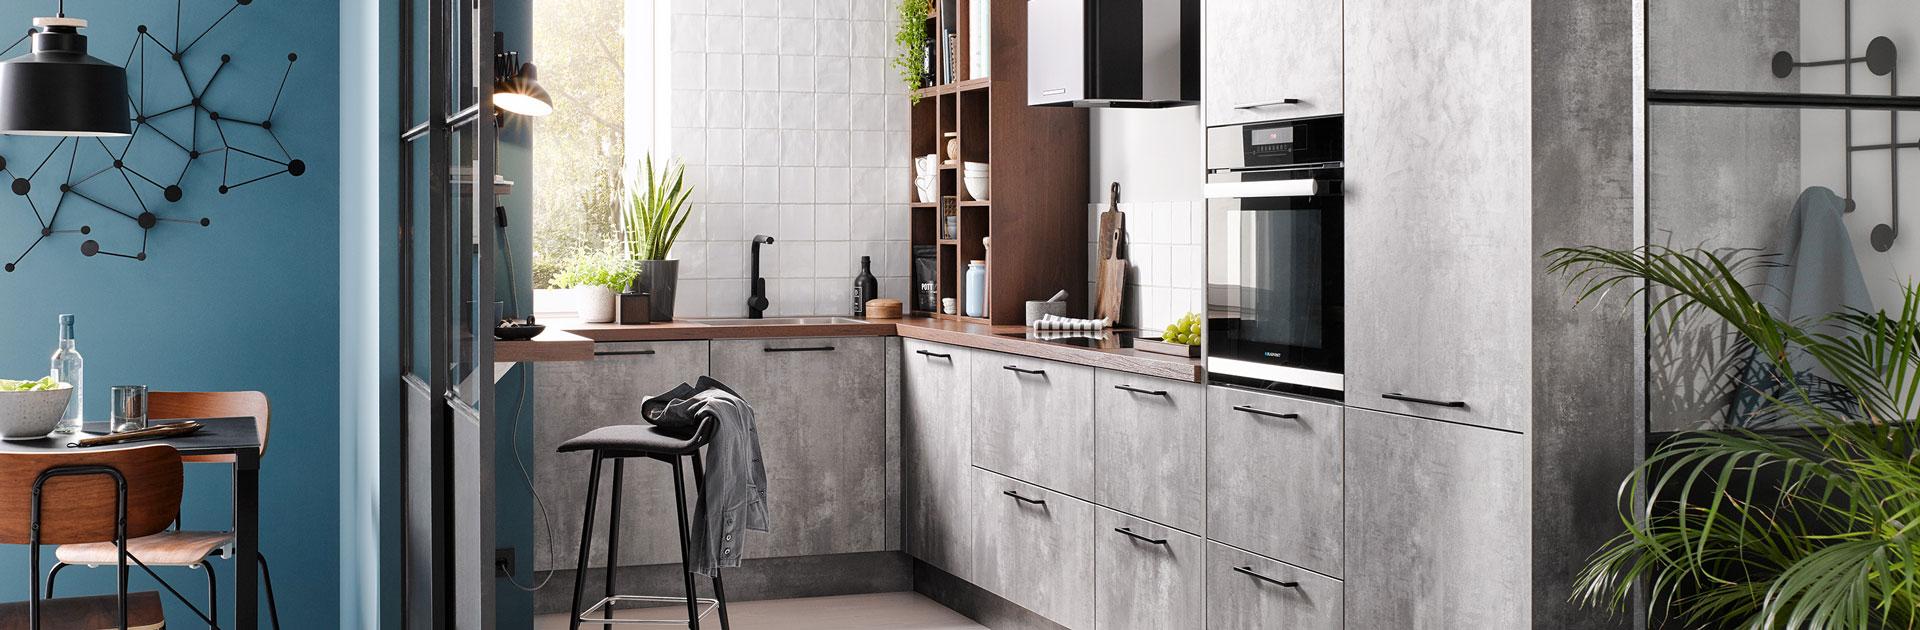 Betonlook keuken met hout keukenblad | Eigenhuis Keukens